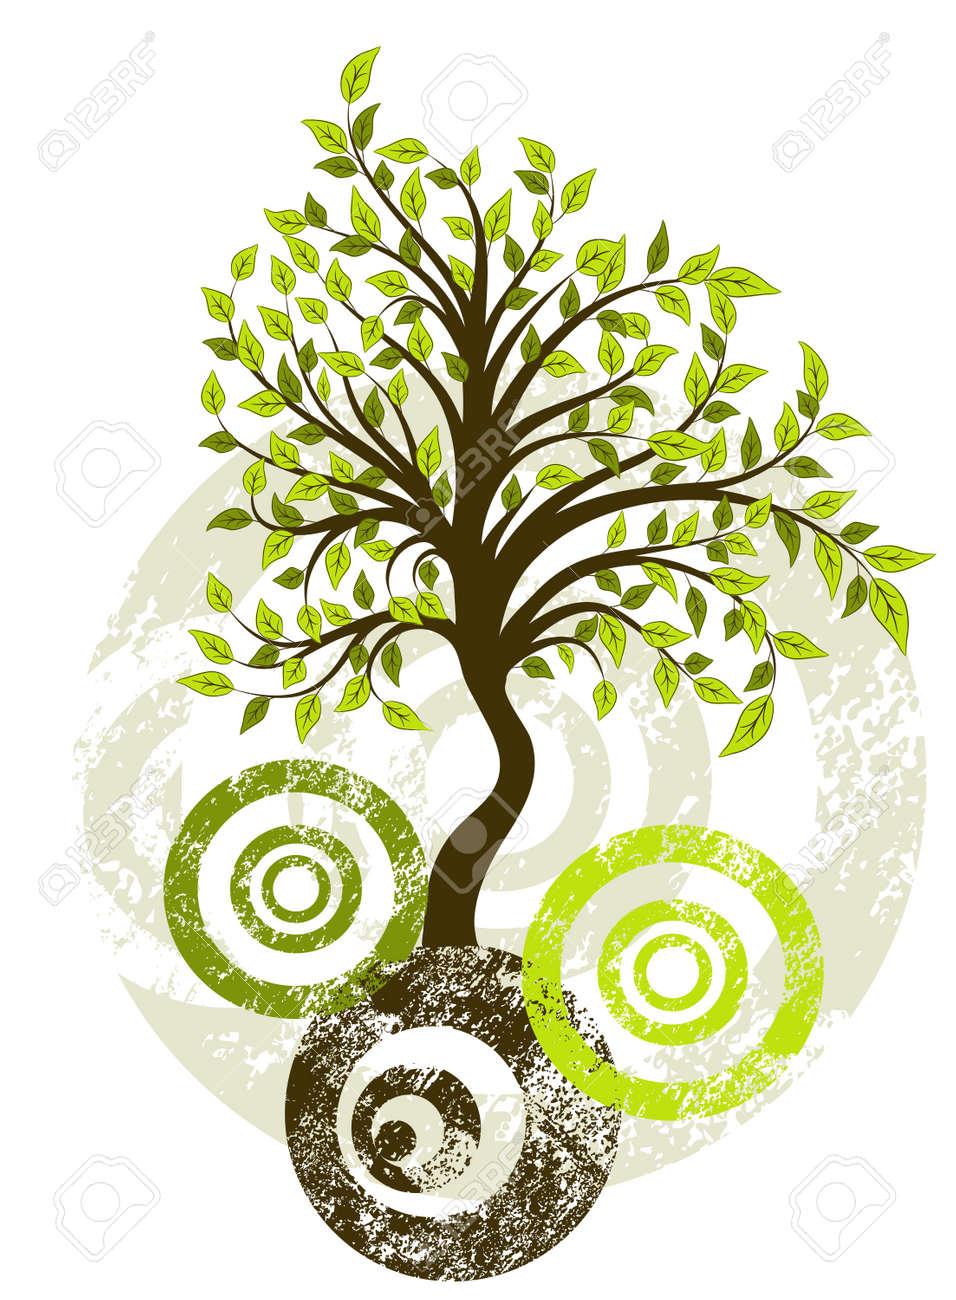 Grunge tree background, vector illustration Stock Vector - 8960798